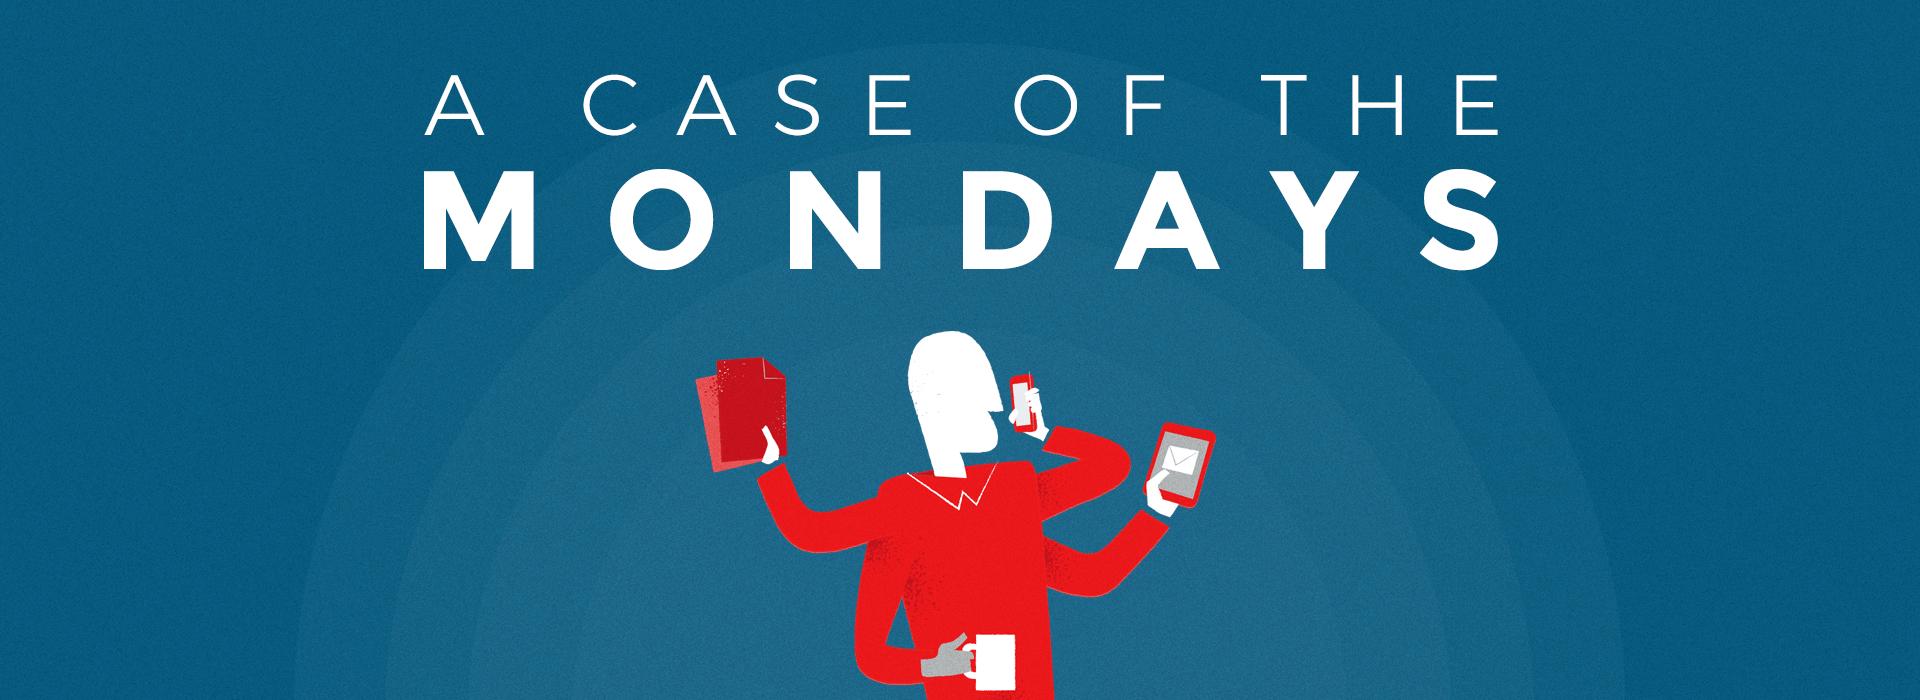 A Case of the Mondays September 2018